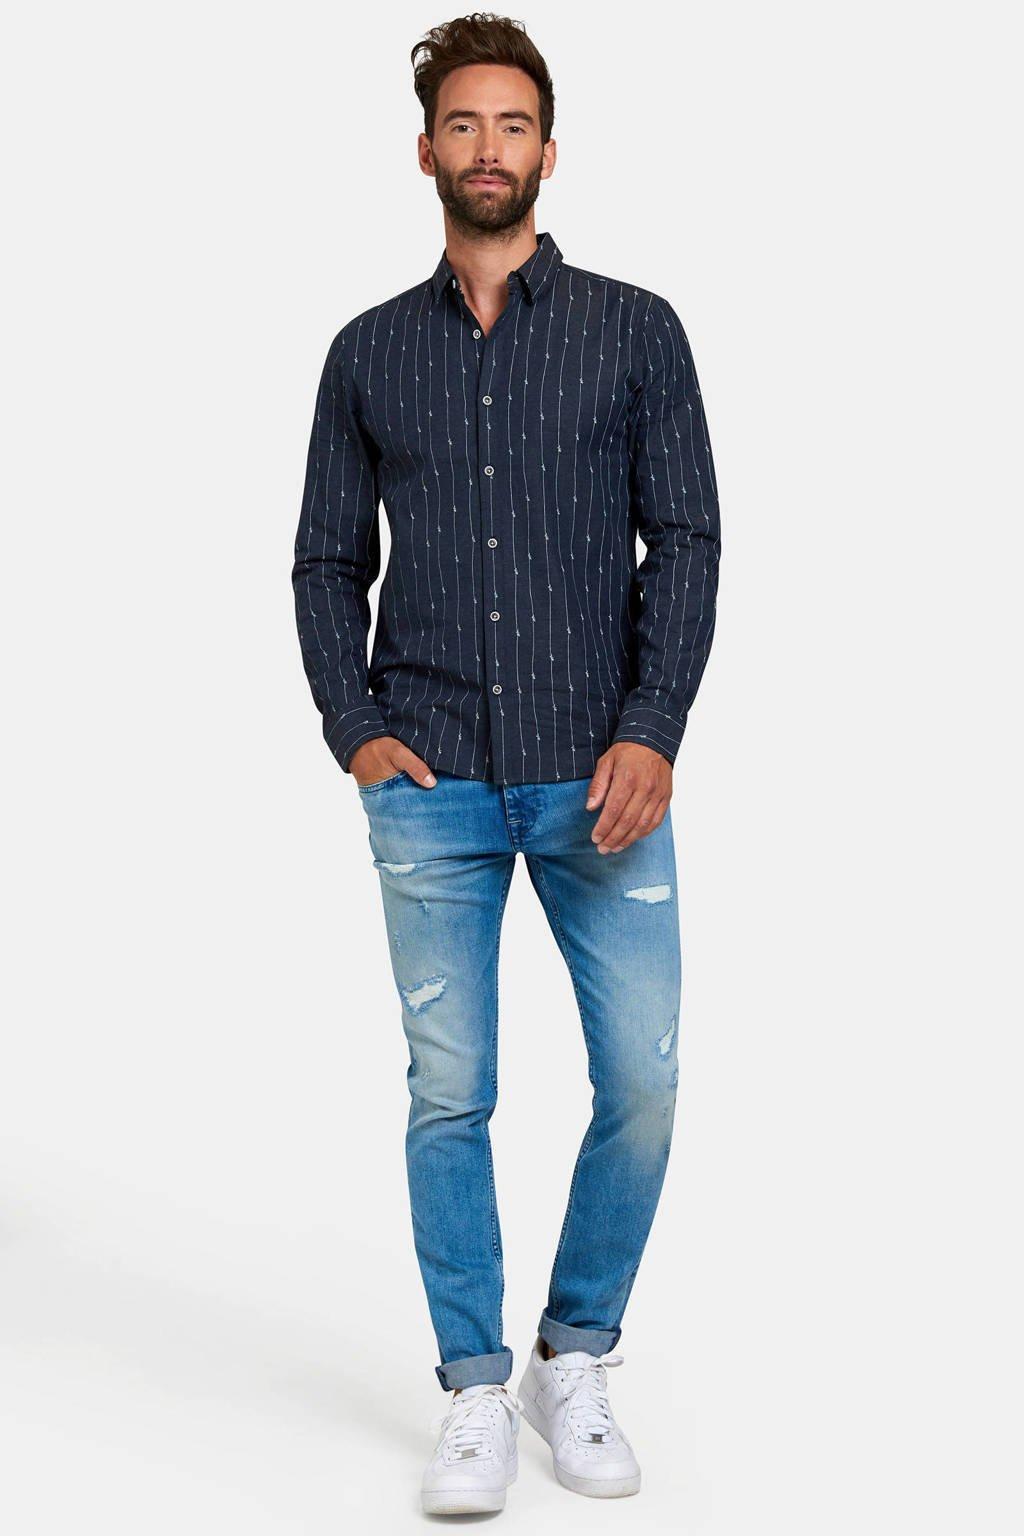 Refill skinny jeans Leroy mediumstone, MEDIUMSTONE